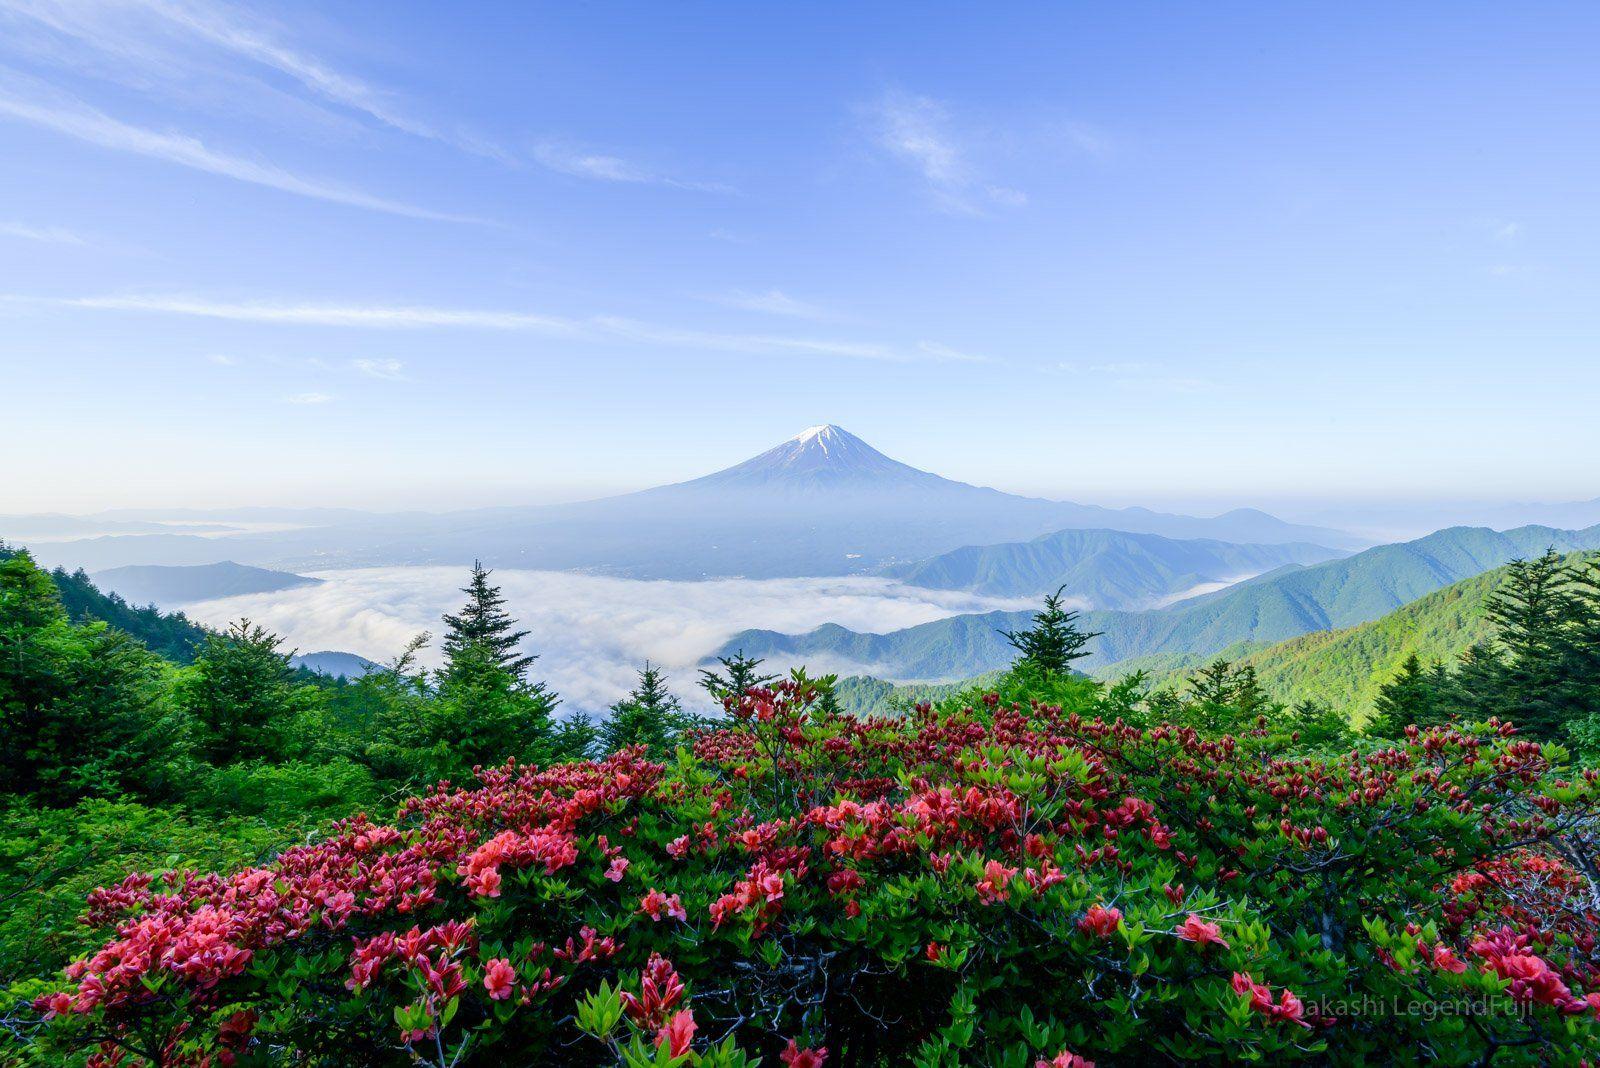 fuji,mountain,japan,azalea,red,green,blue,sea of cloud,cloud,tree,lake,spring,flower, Takashi